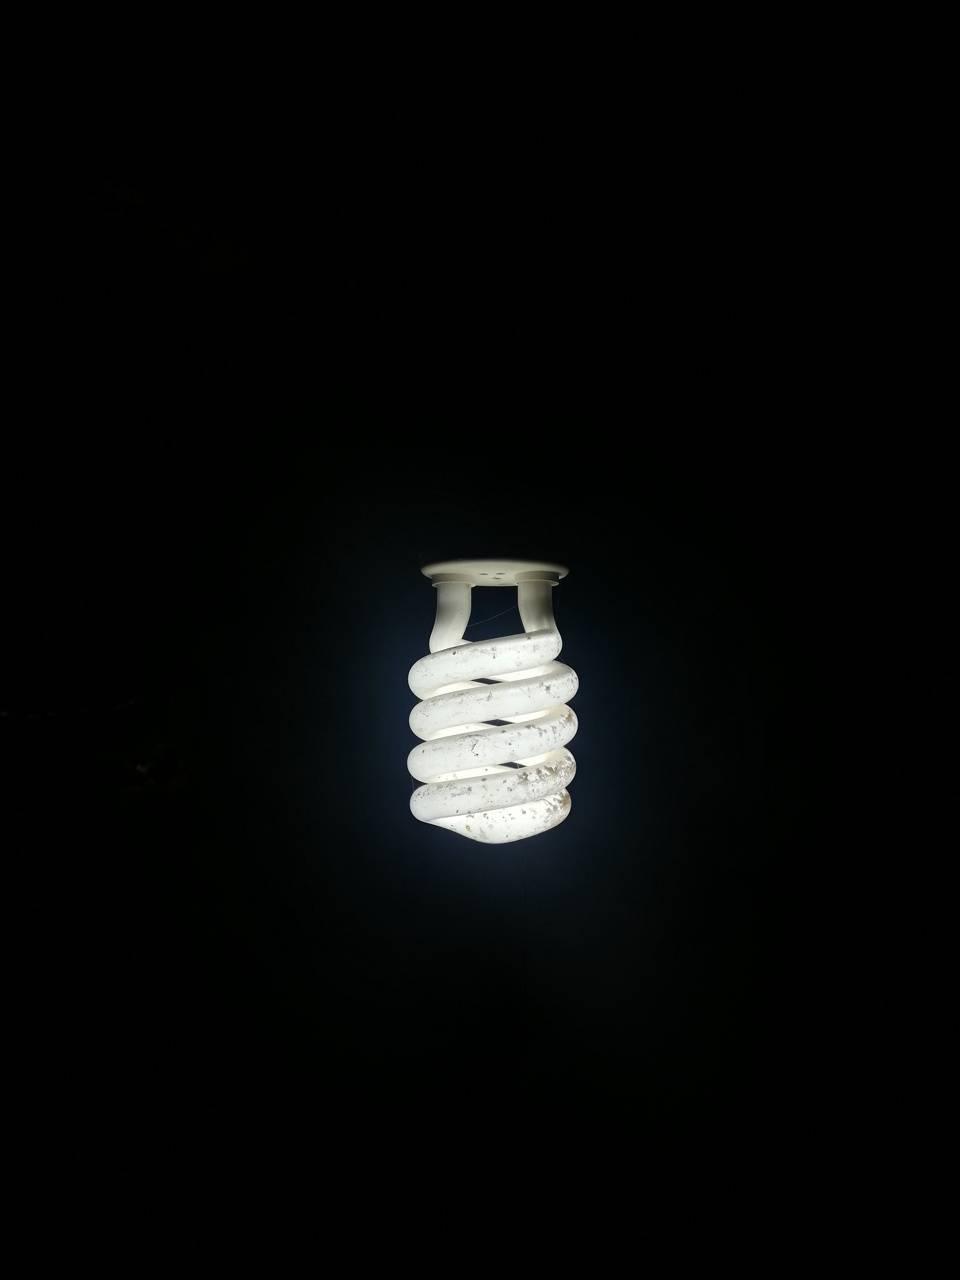 Bulb Wallpaper By Zeecreations Af Free On Zedge